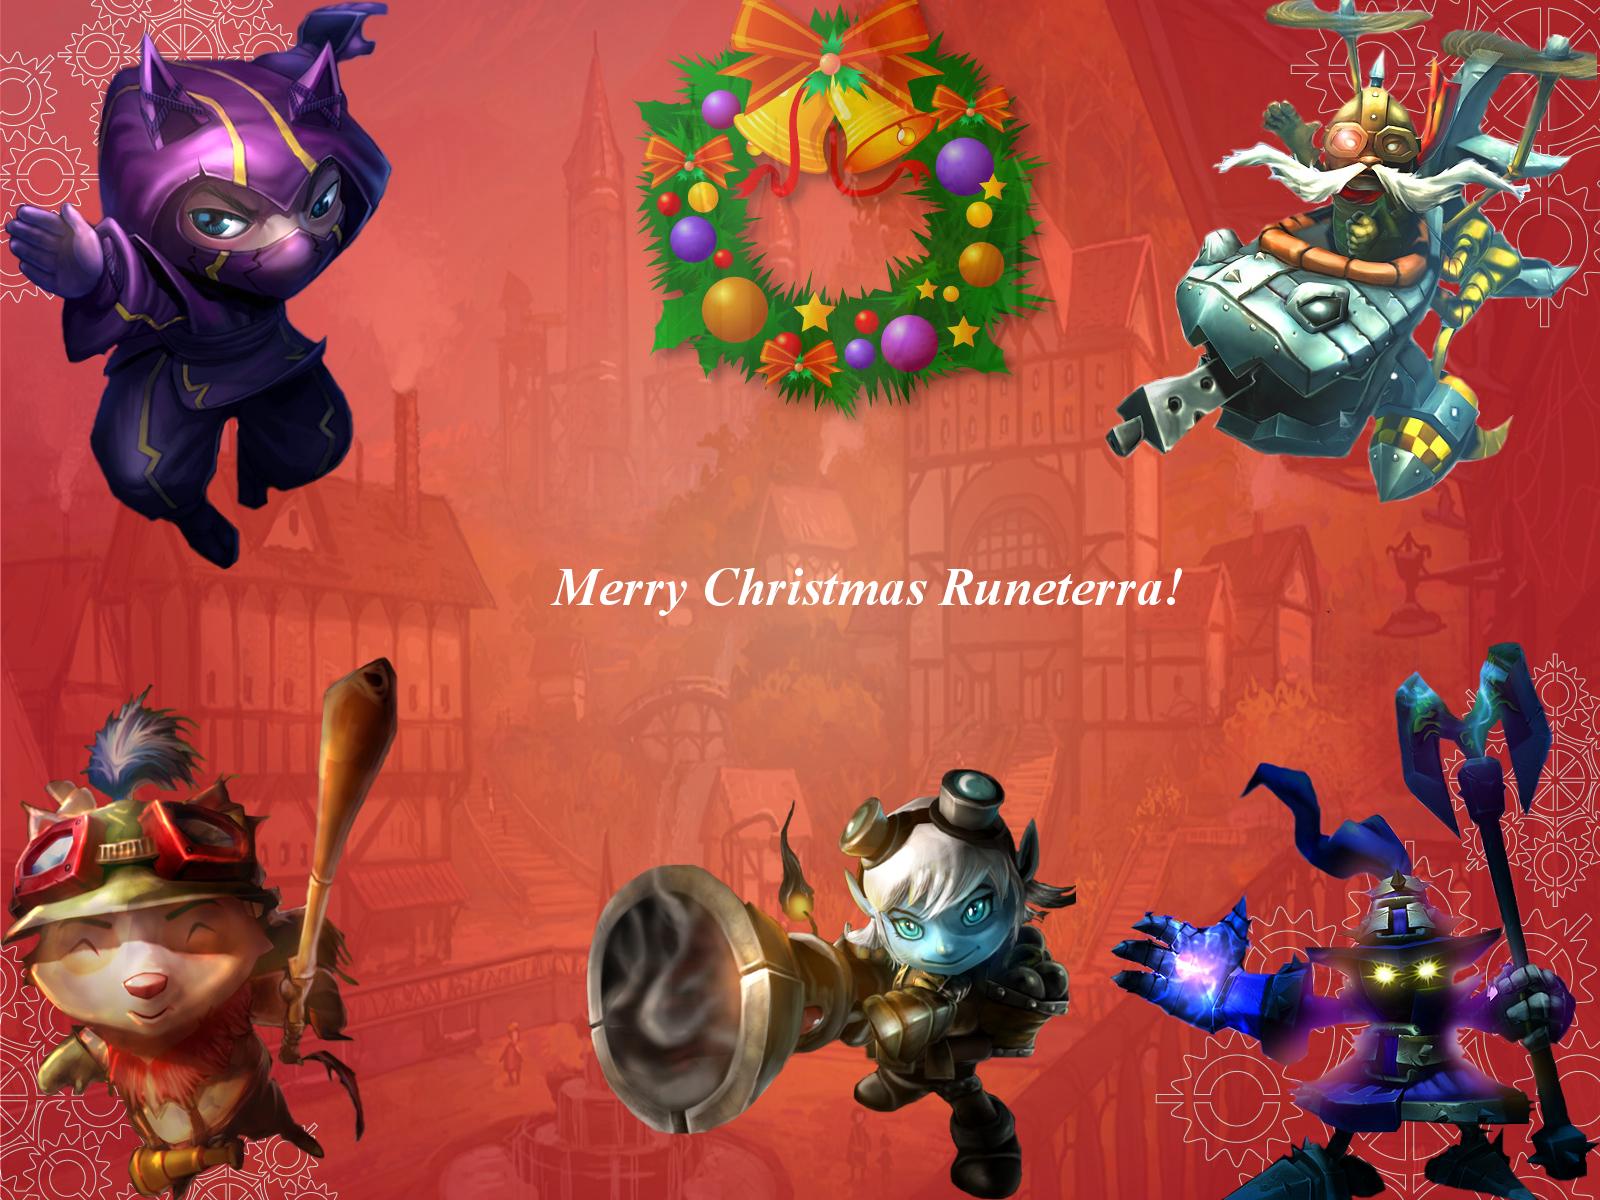 http://4.bp.blogspot.com/_L78zEKWCMII/TPBKi4PYm6I/AAAAAAAABF0/I69EIl_oUcE/s1600/merry-christmas.jpg